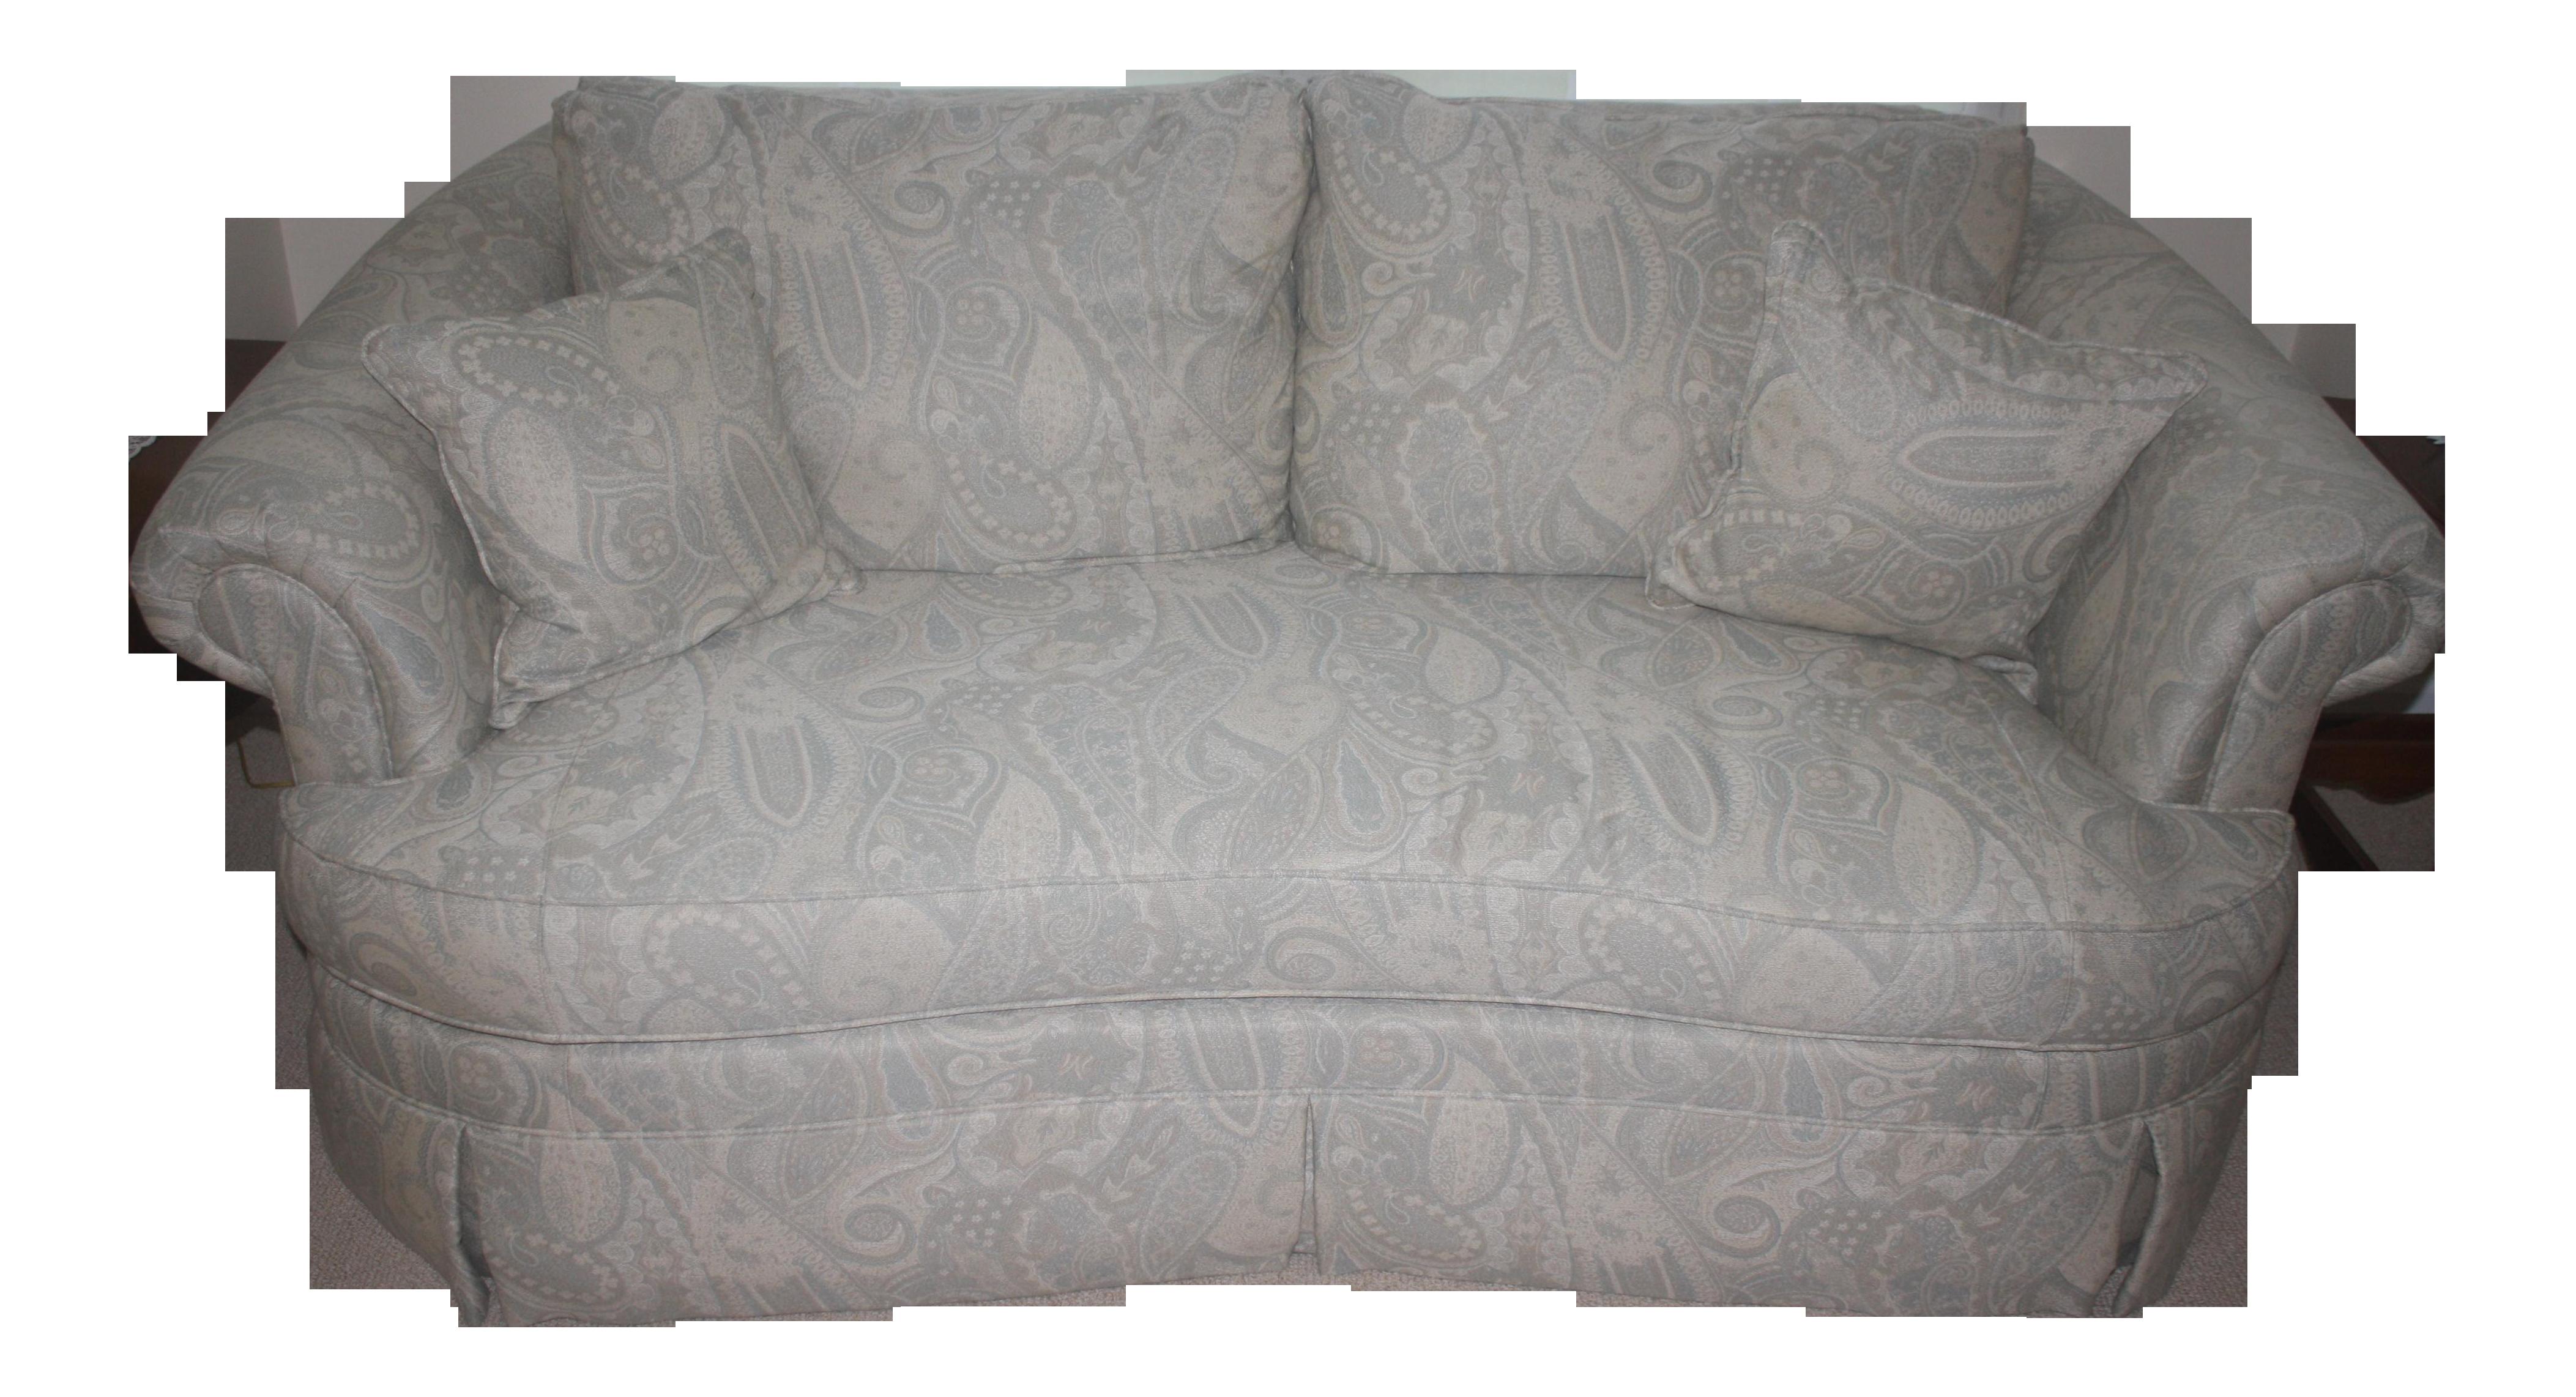 Ethan Allen Paris Sofa Couch Loveseat